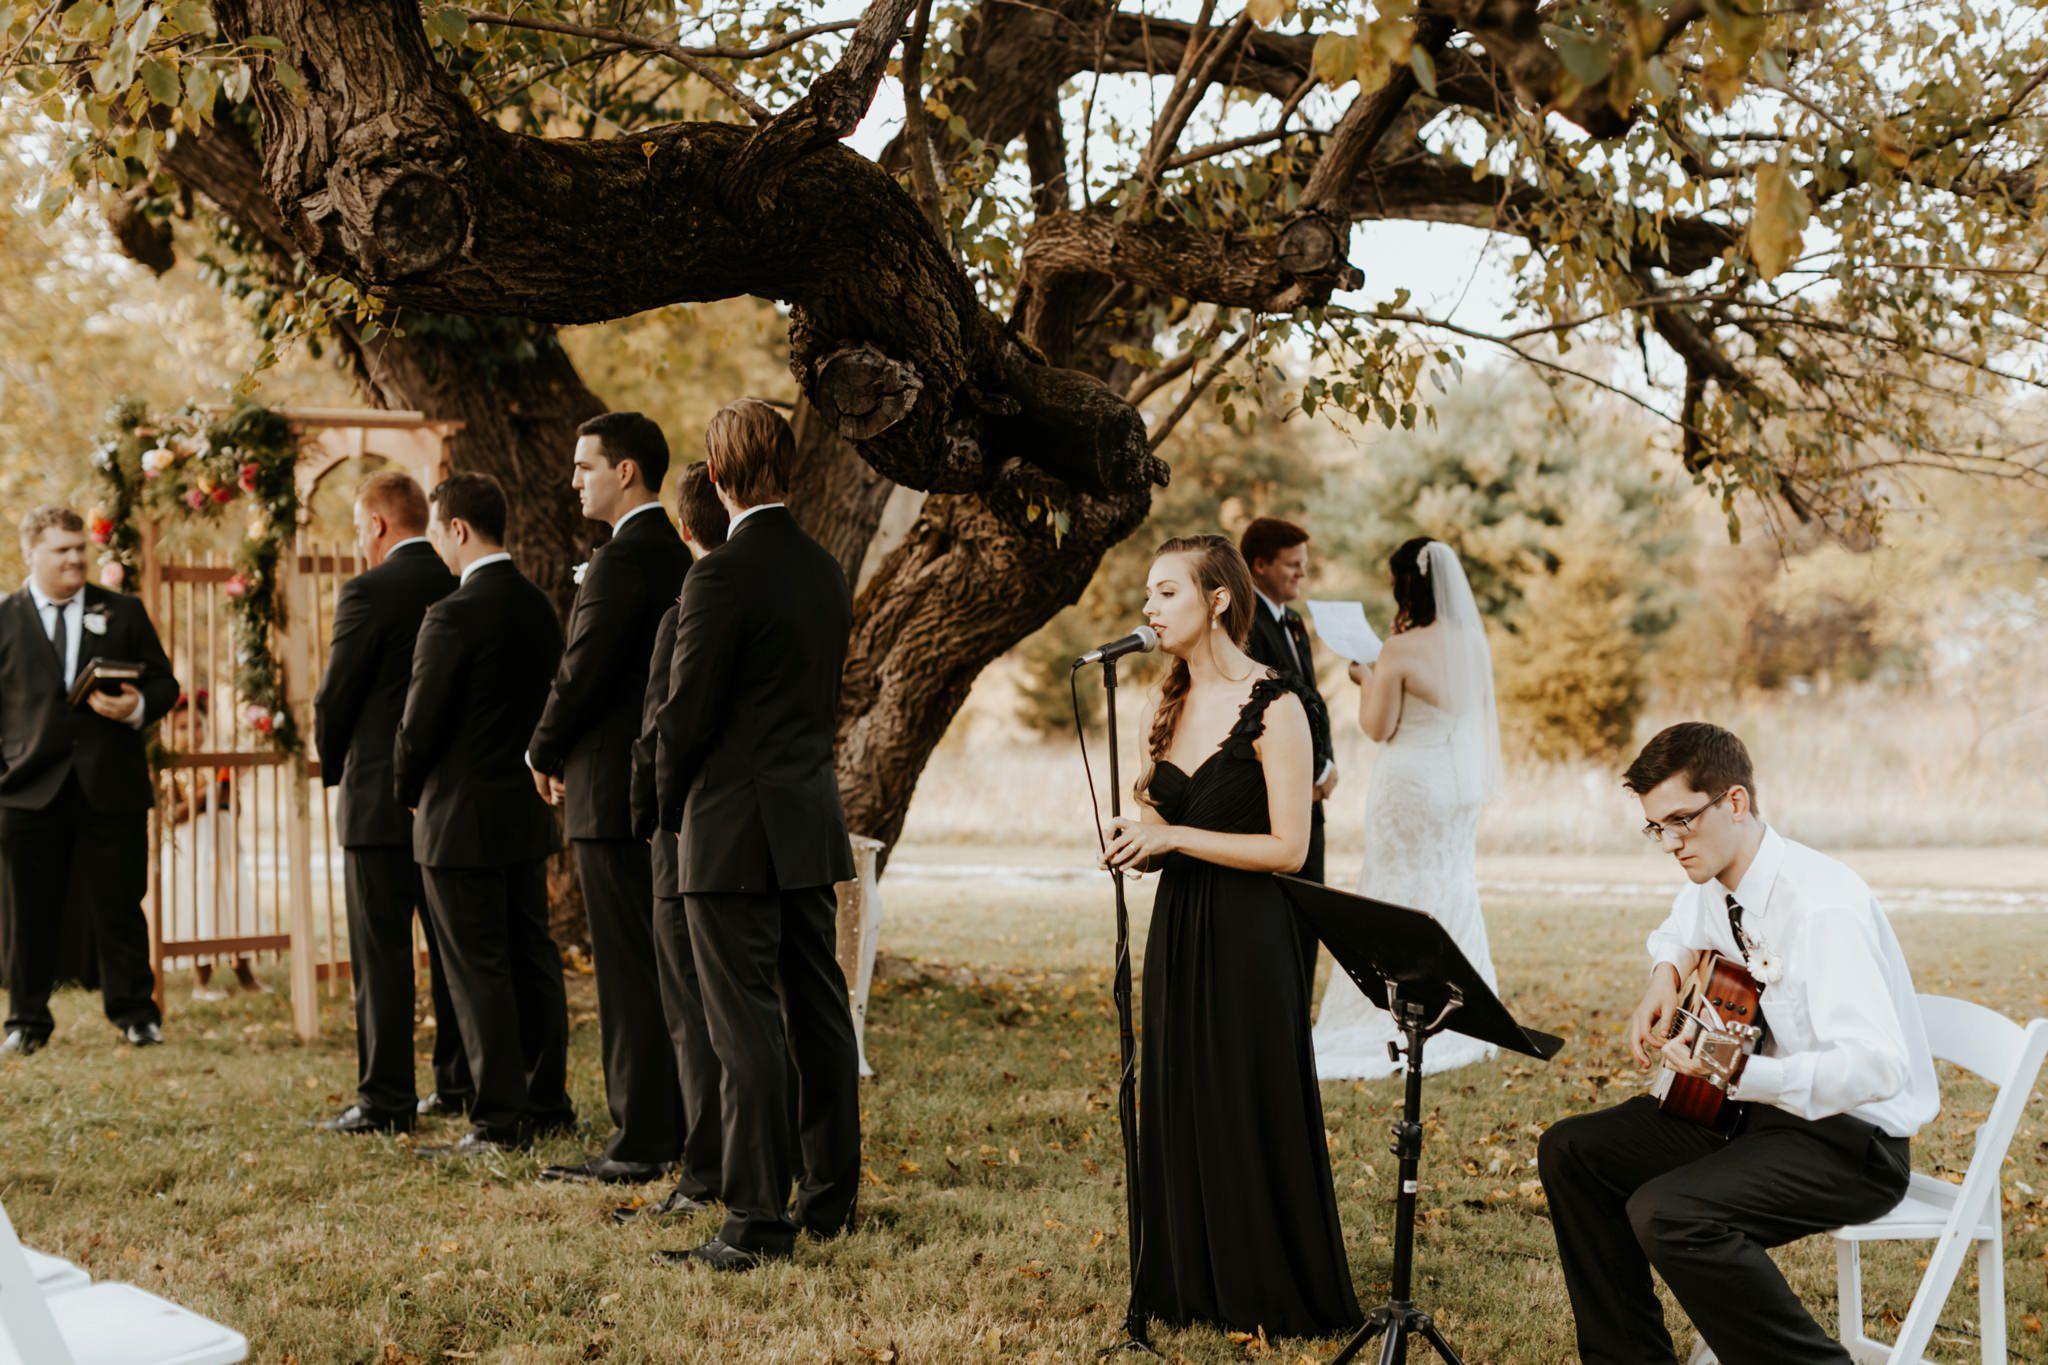 17-09-15 Lindsey and Brandon Wedding Edited-716_WEB.jpg